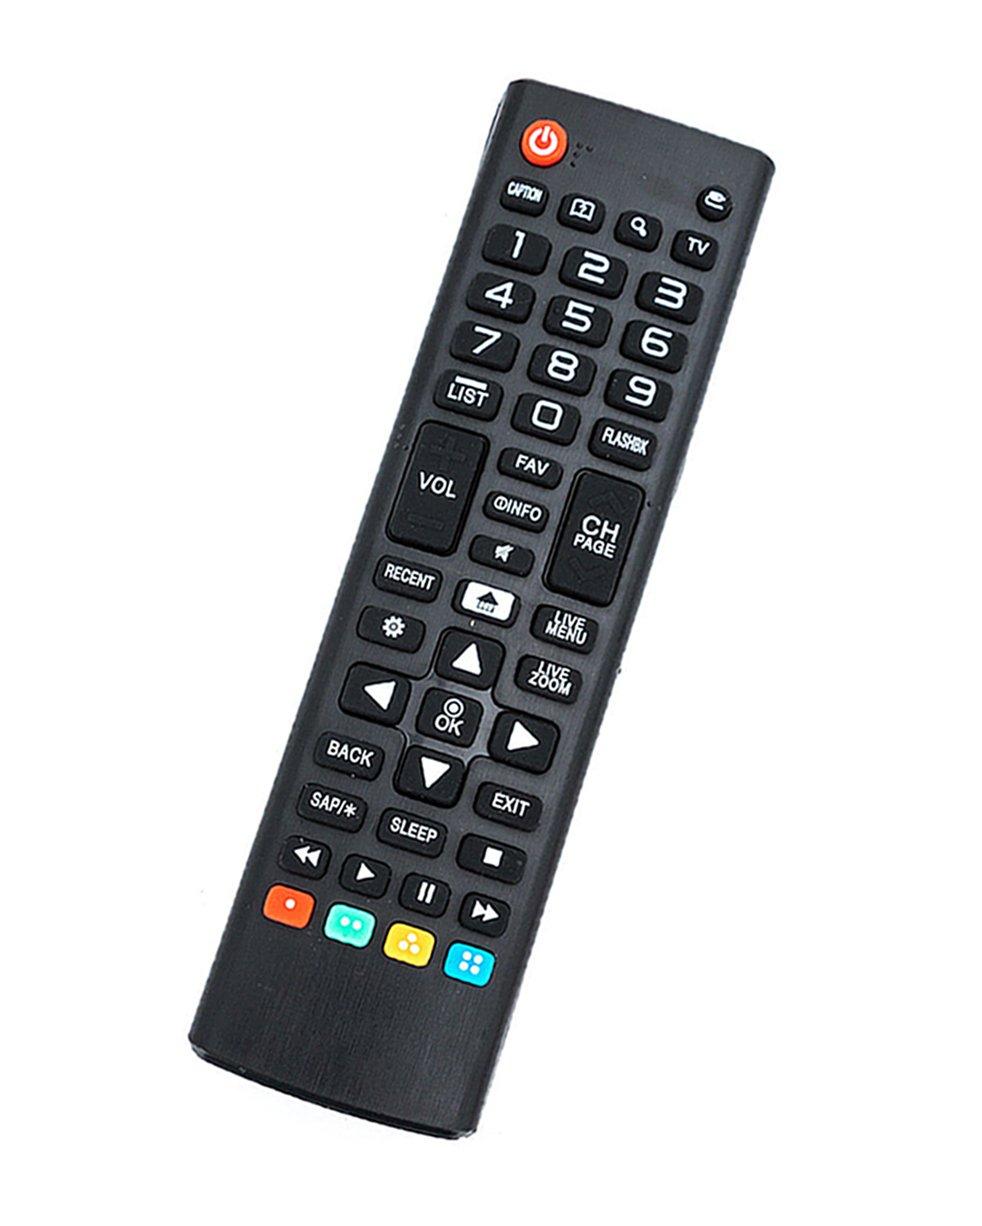 JustFine 交換用リモコン 対応機種: LG 50LF6500-UB 50UF8300 50UF8300A 50UF8300UA 50UF8300-UA 55EA9850 55EF9500 55EF9500 HD LCD LED Smart TV   B07CWDZ815